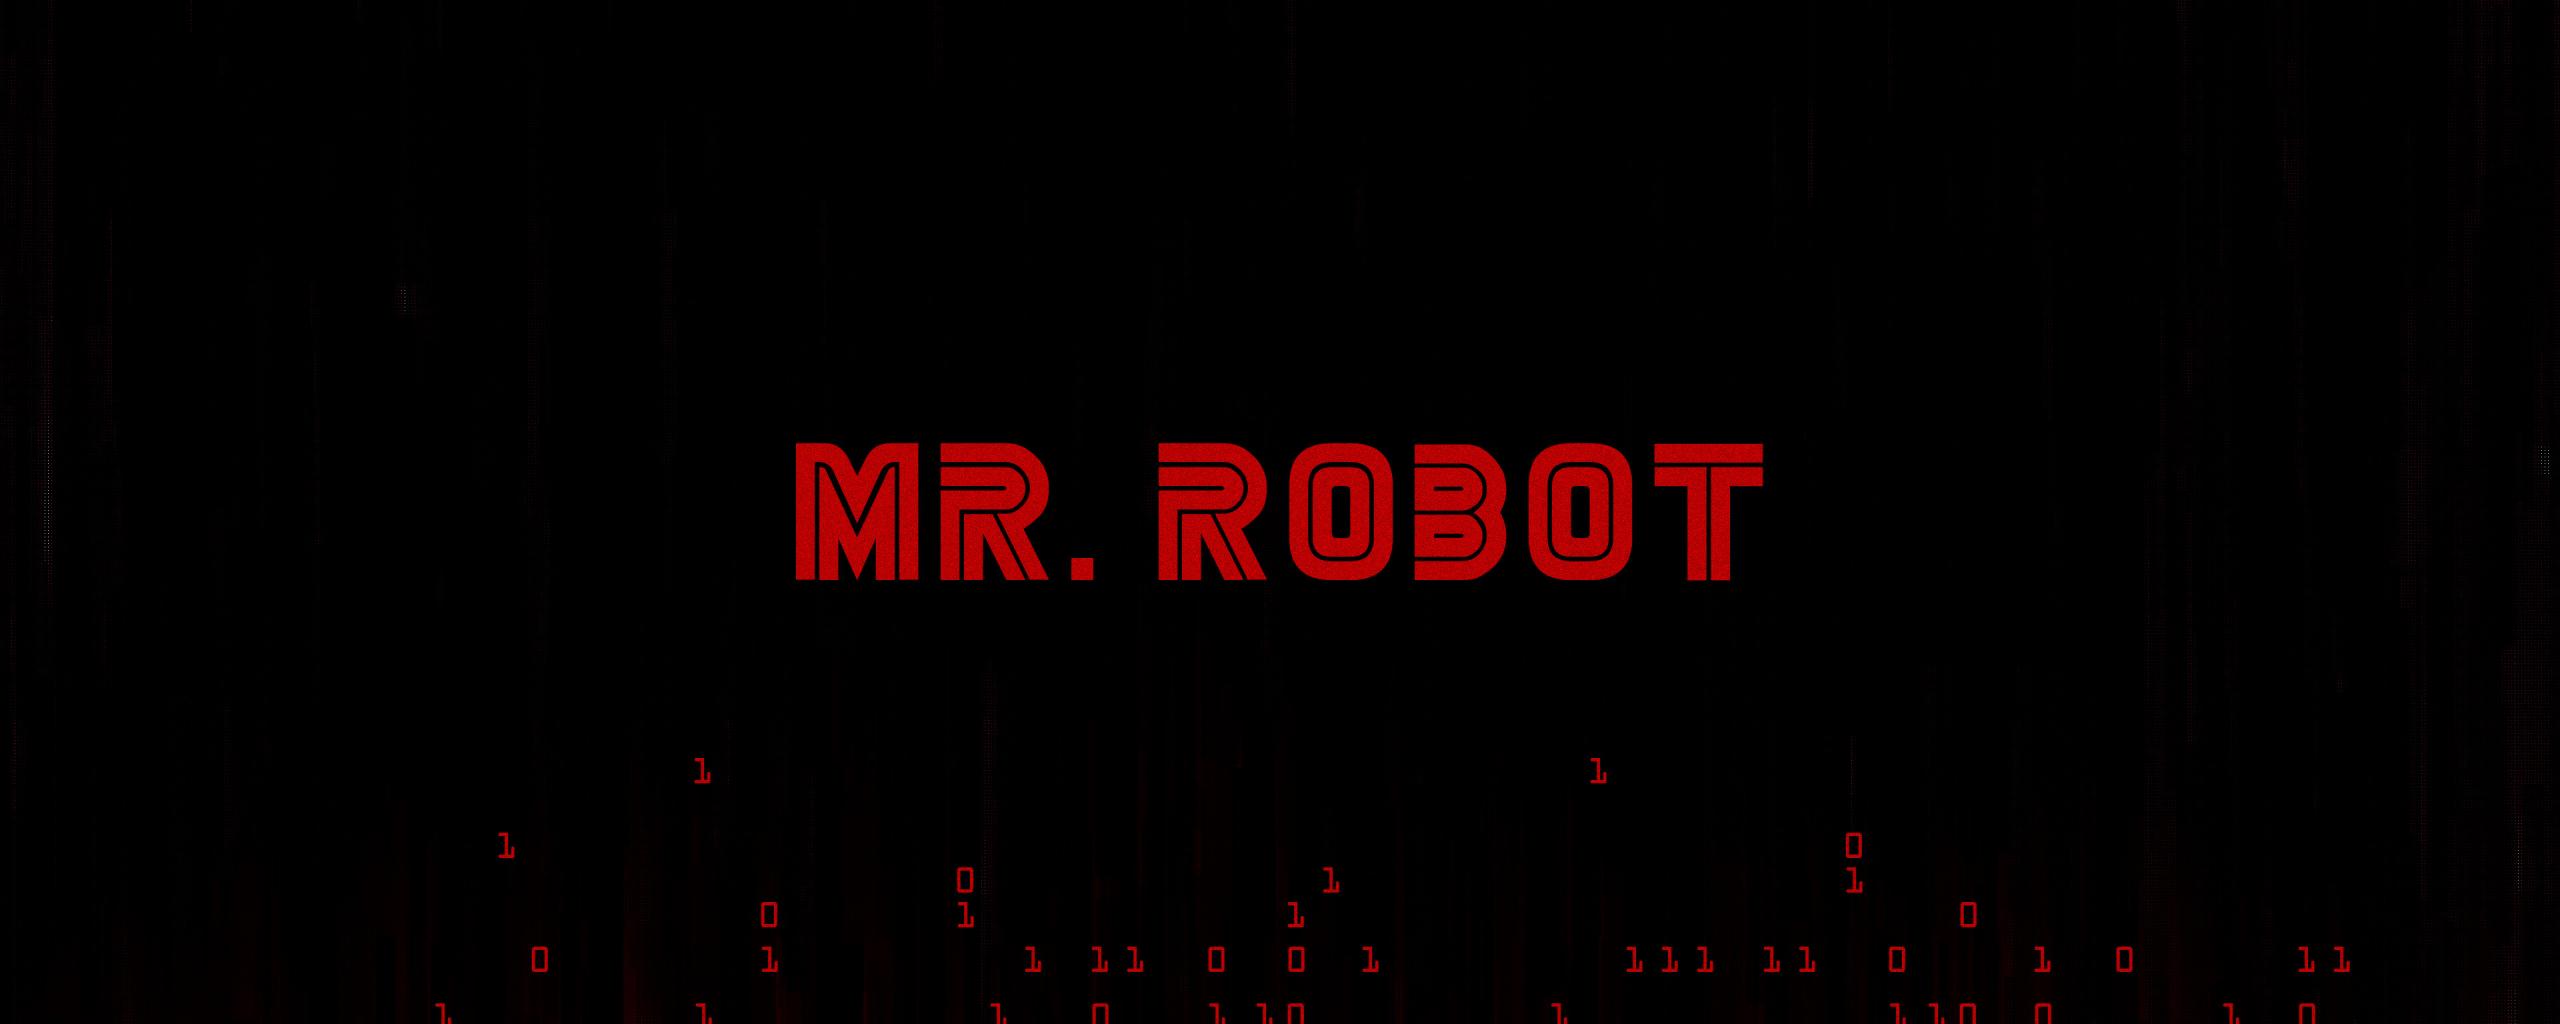 Desktop Wallpaper Mr Robot Logo Tv Series 4k Hd Image Picture Background E79460